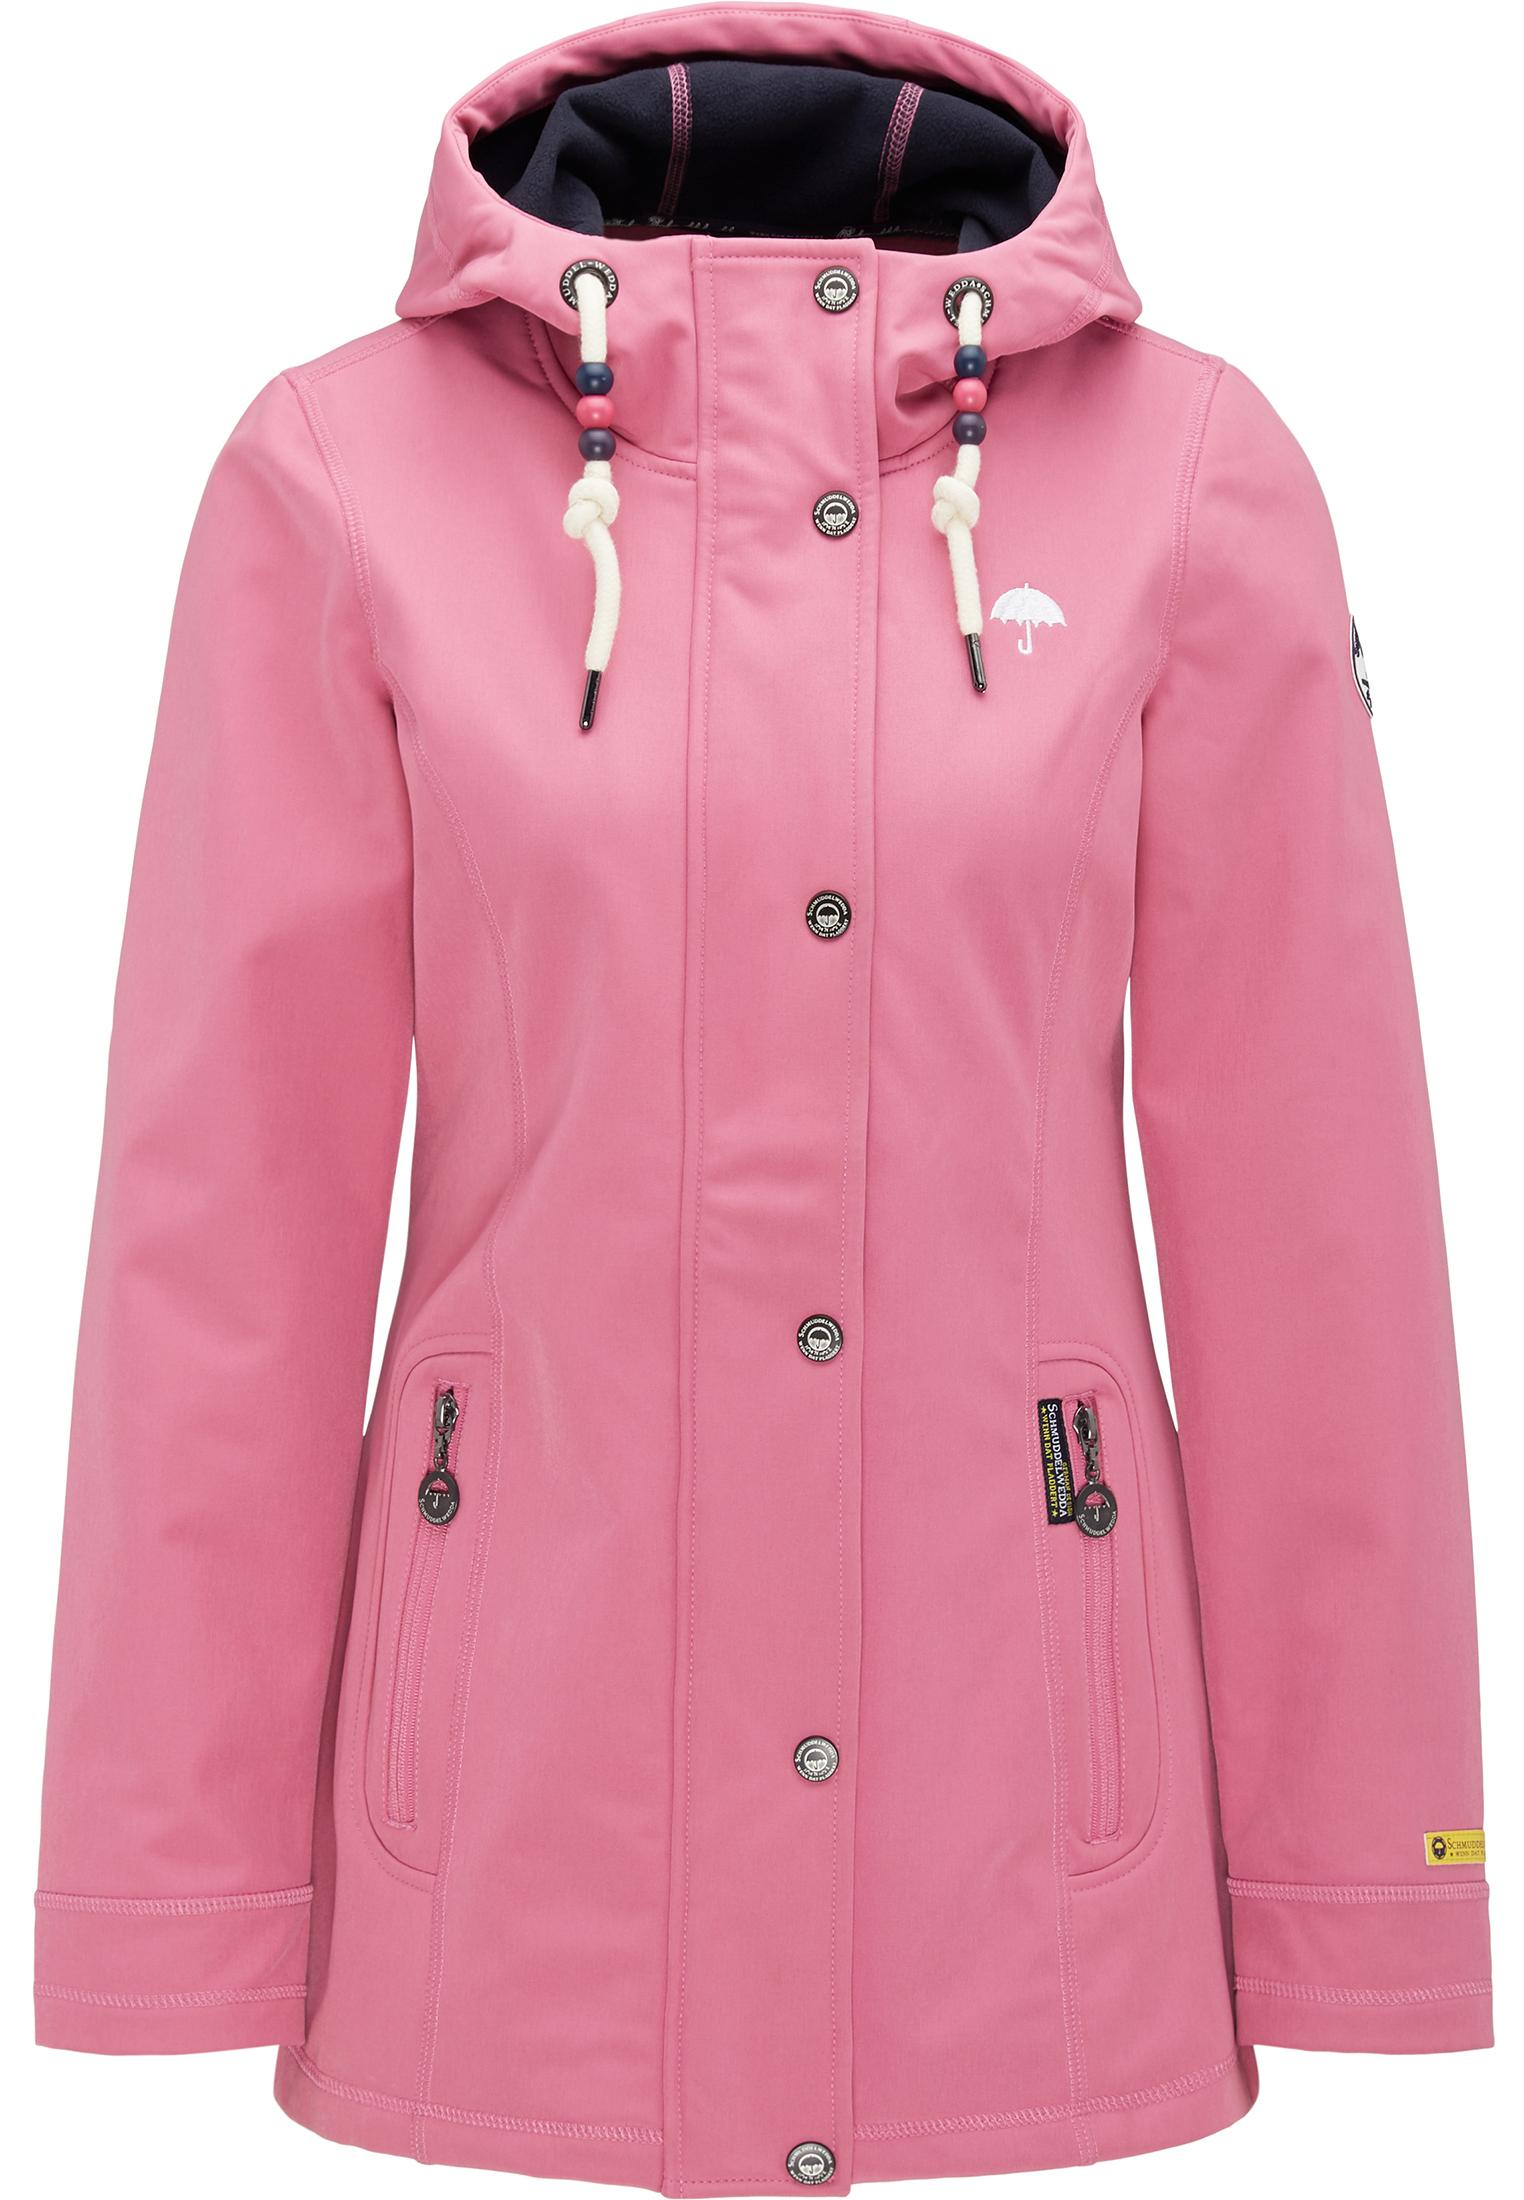 Outdoorjacke damen pink